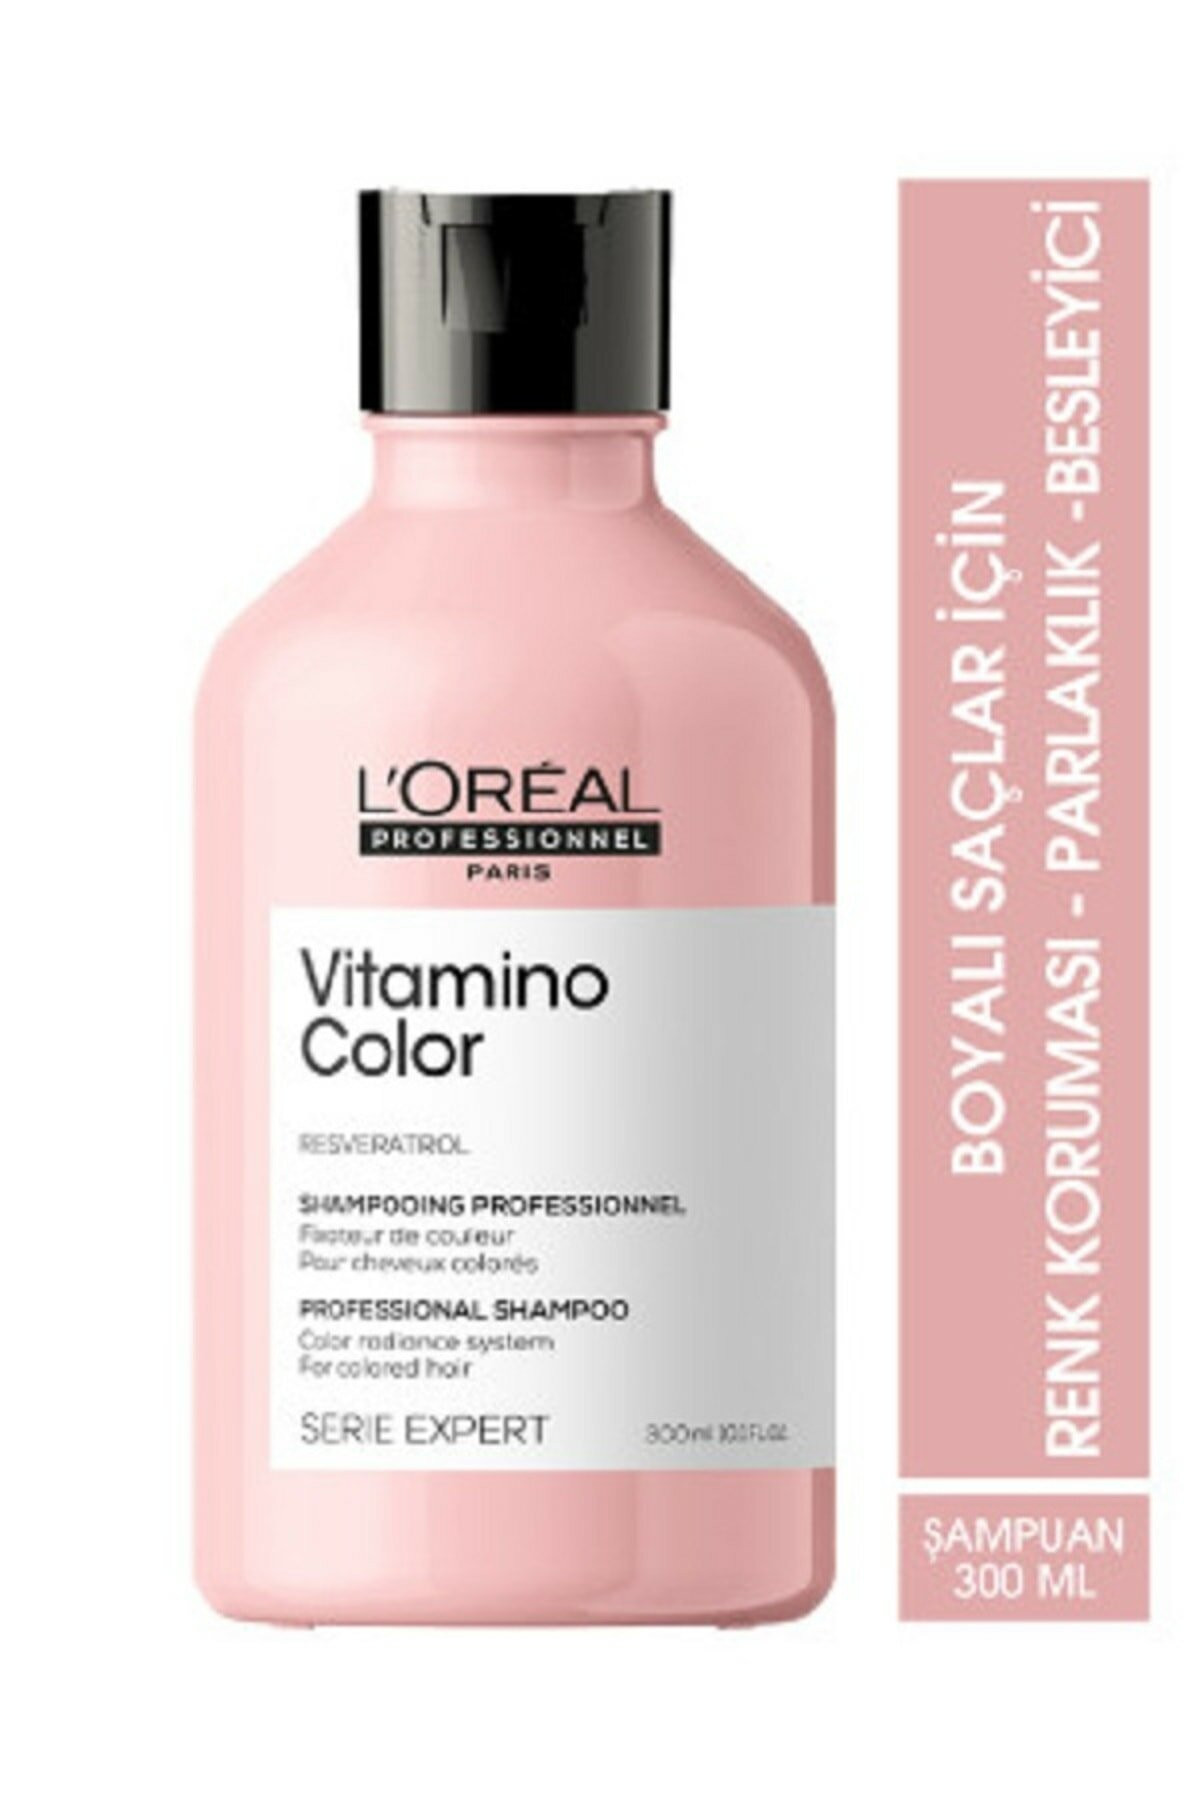 L'oreal Professionnel Serie Expert Vitamino Color Renk Koruyucu Şampuan 300 ml